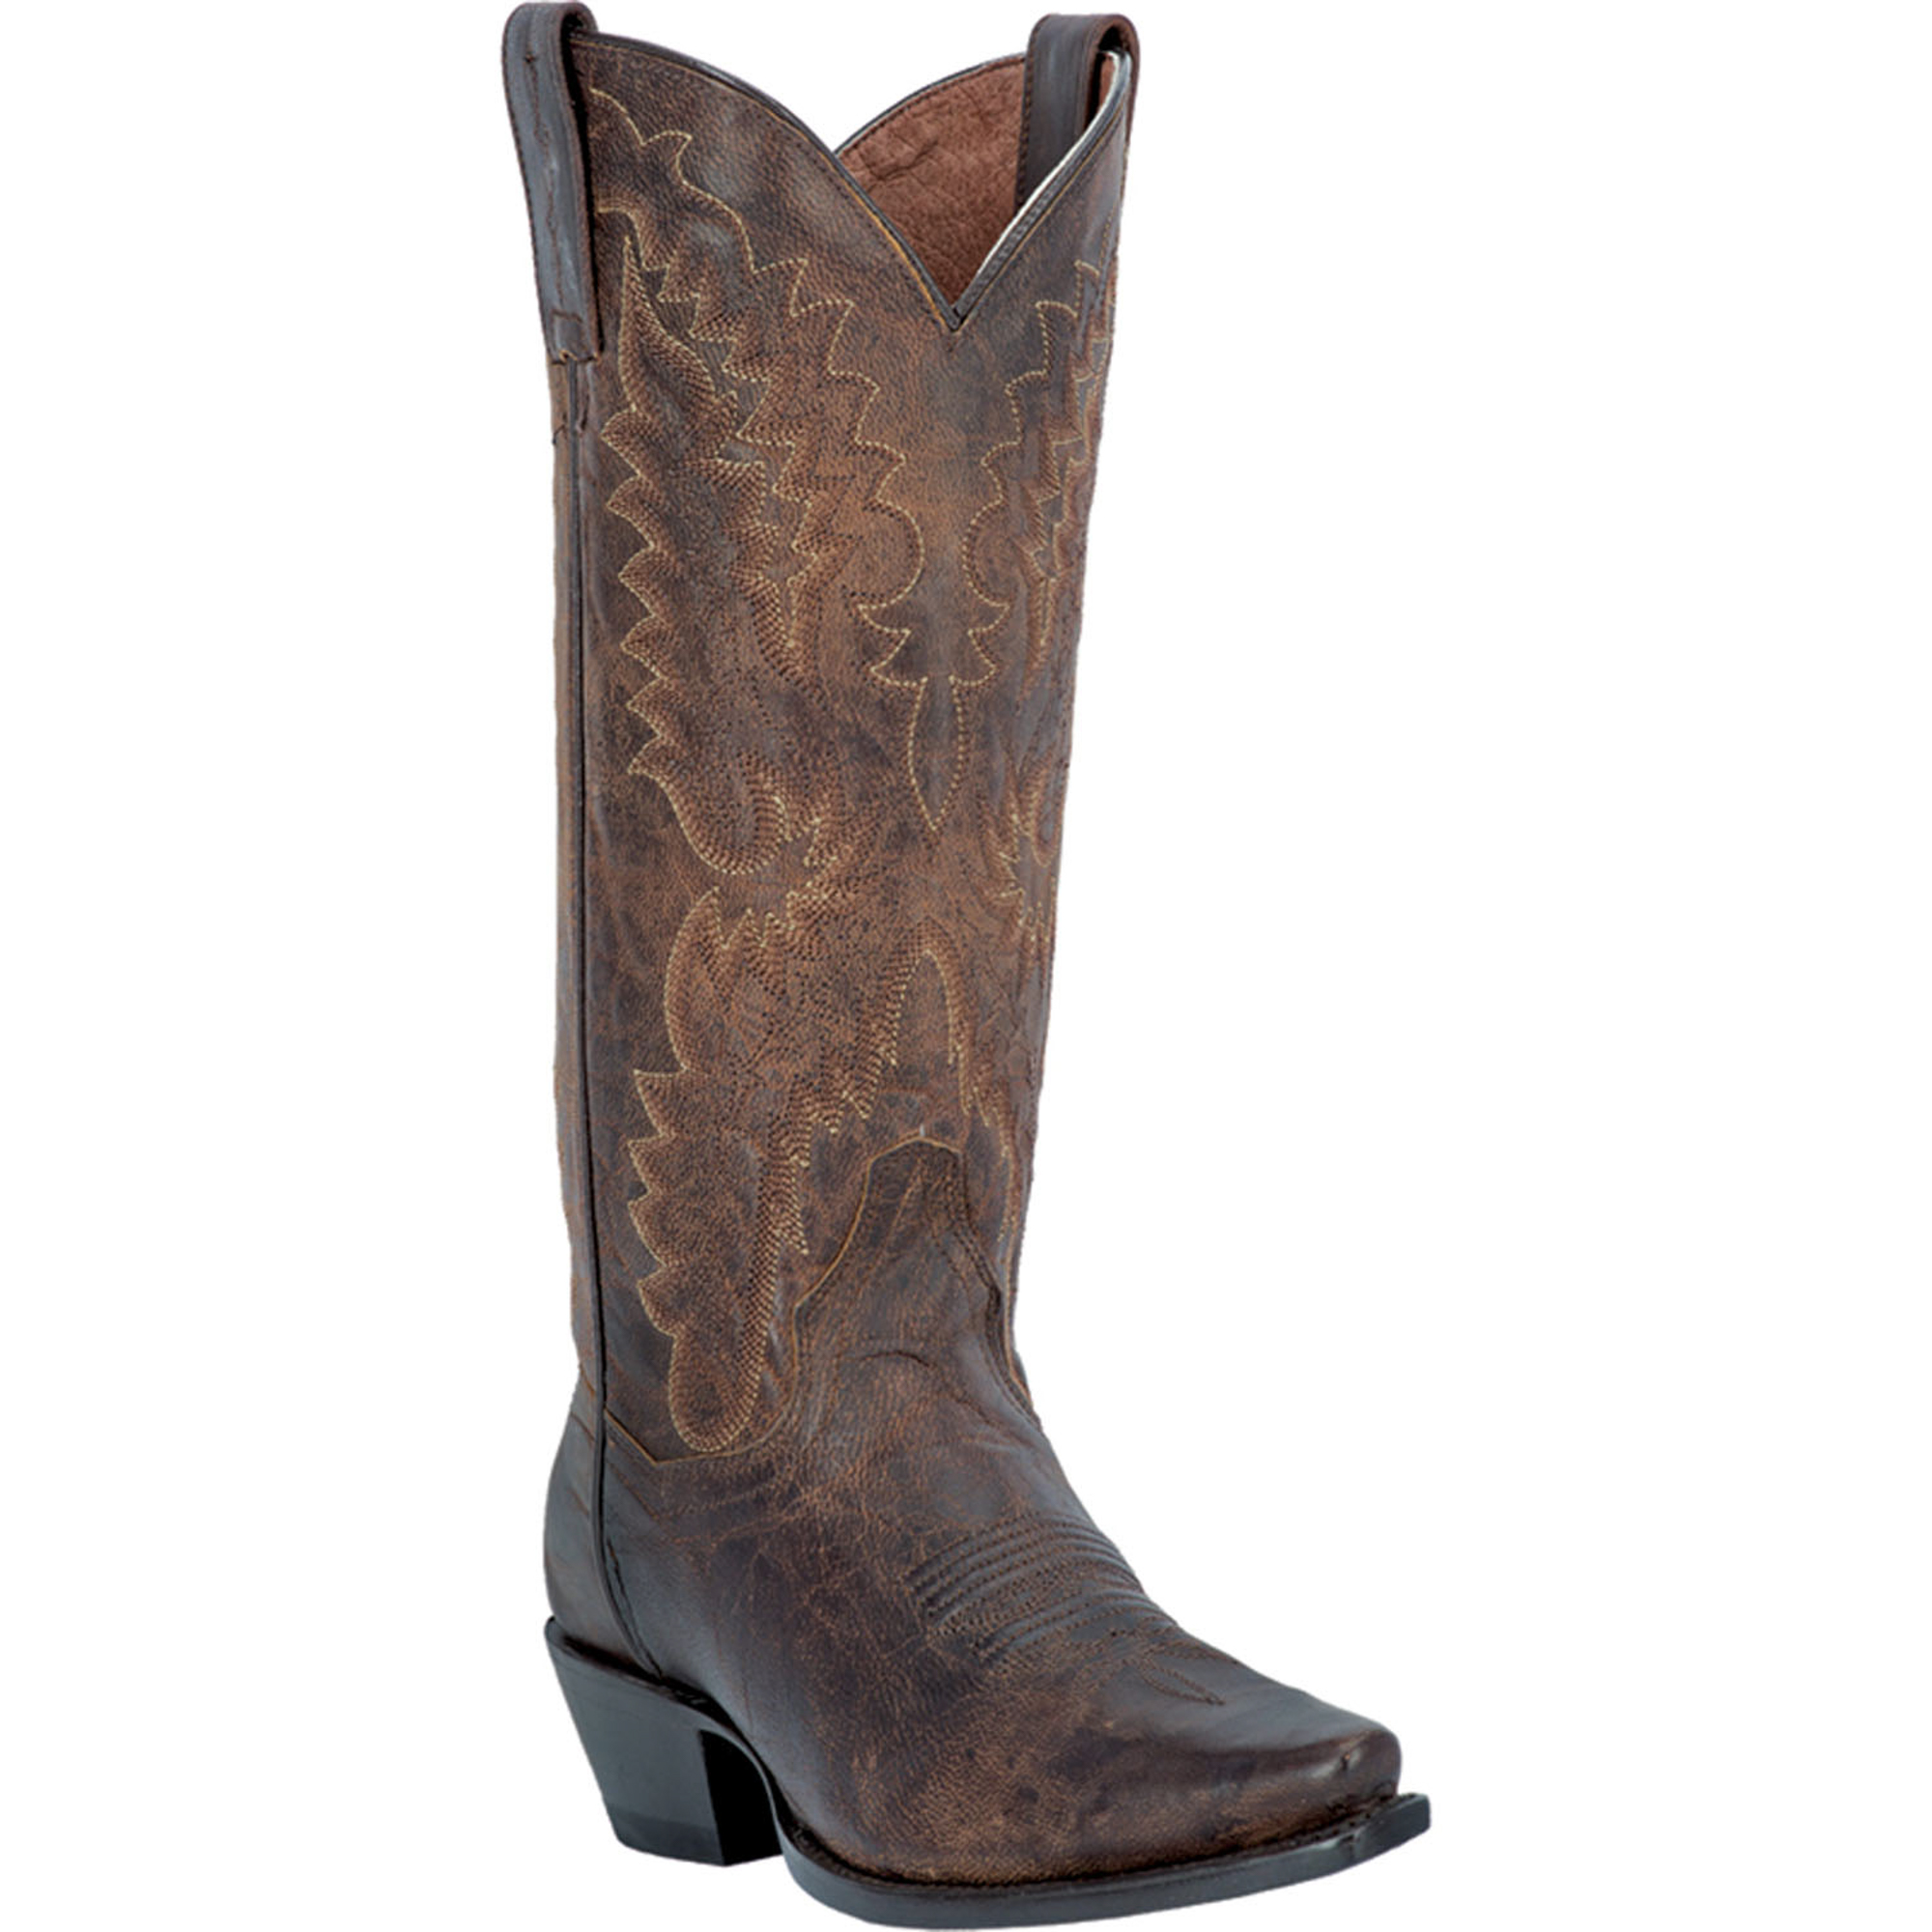 Creative DAN POST Cowboy Certified Women39s WILD RIDE Leather Western Cowboy